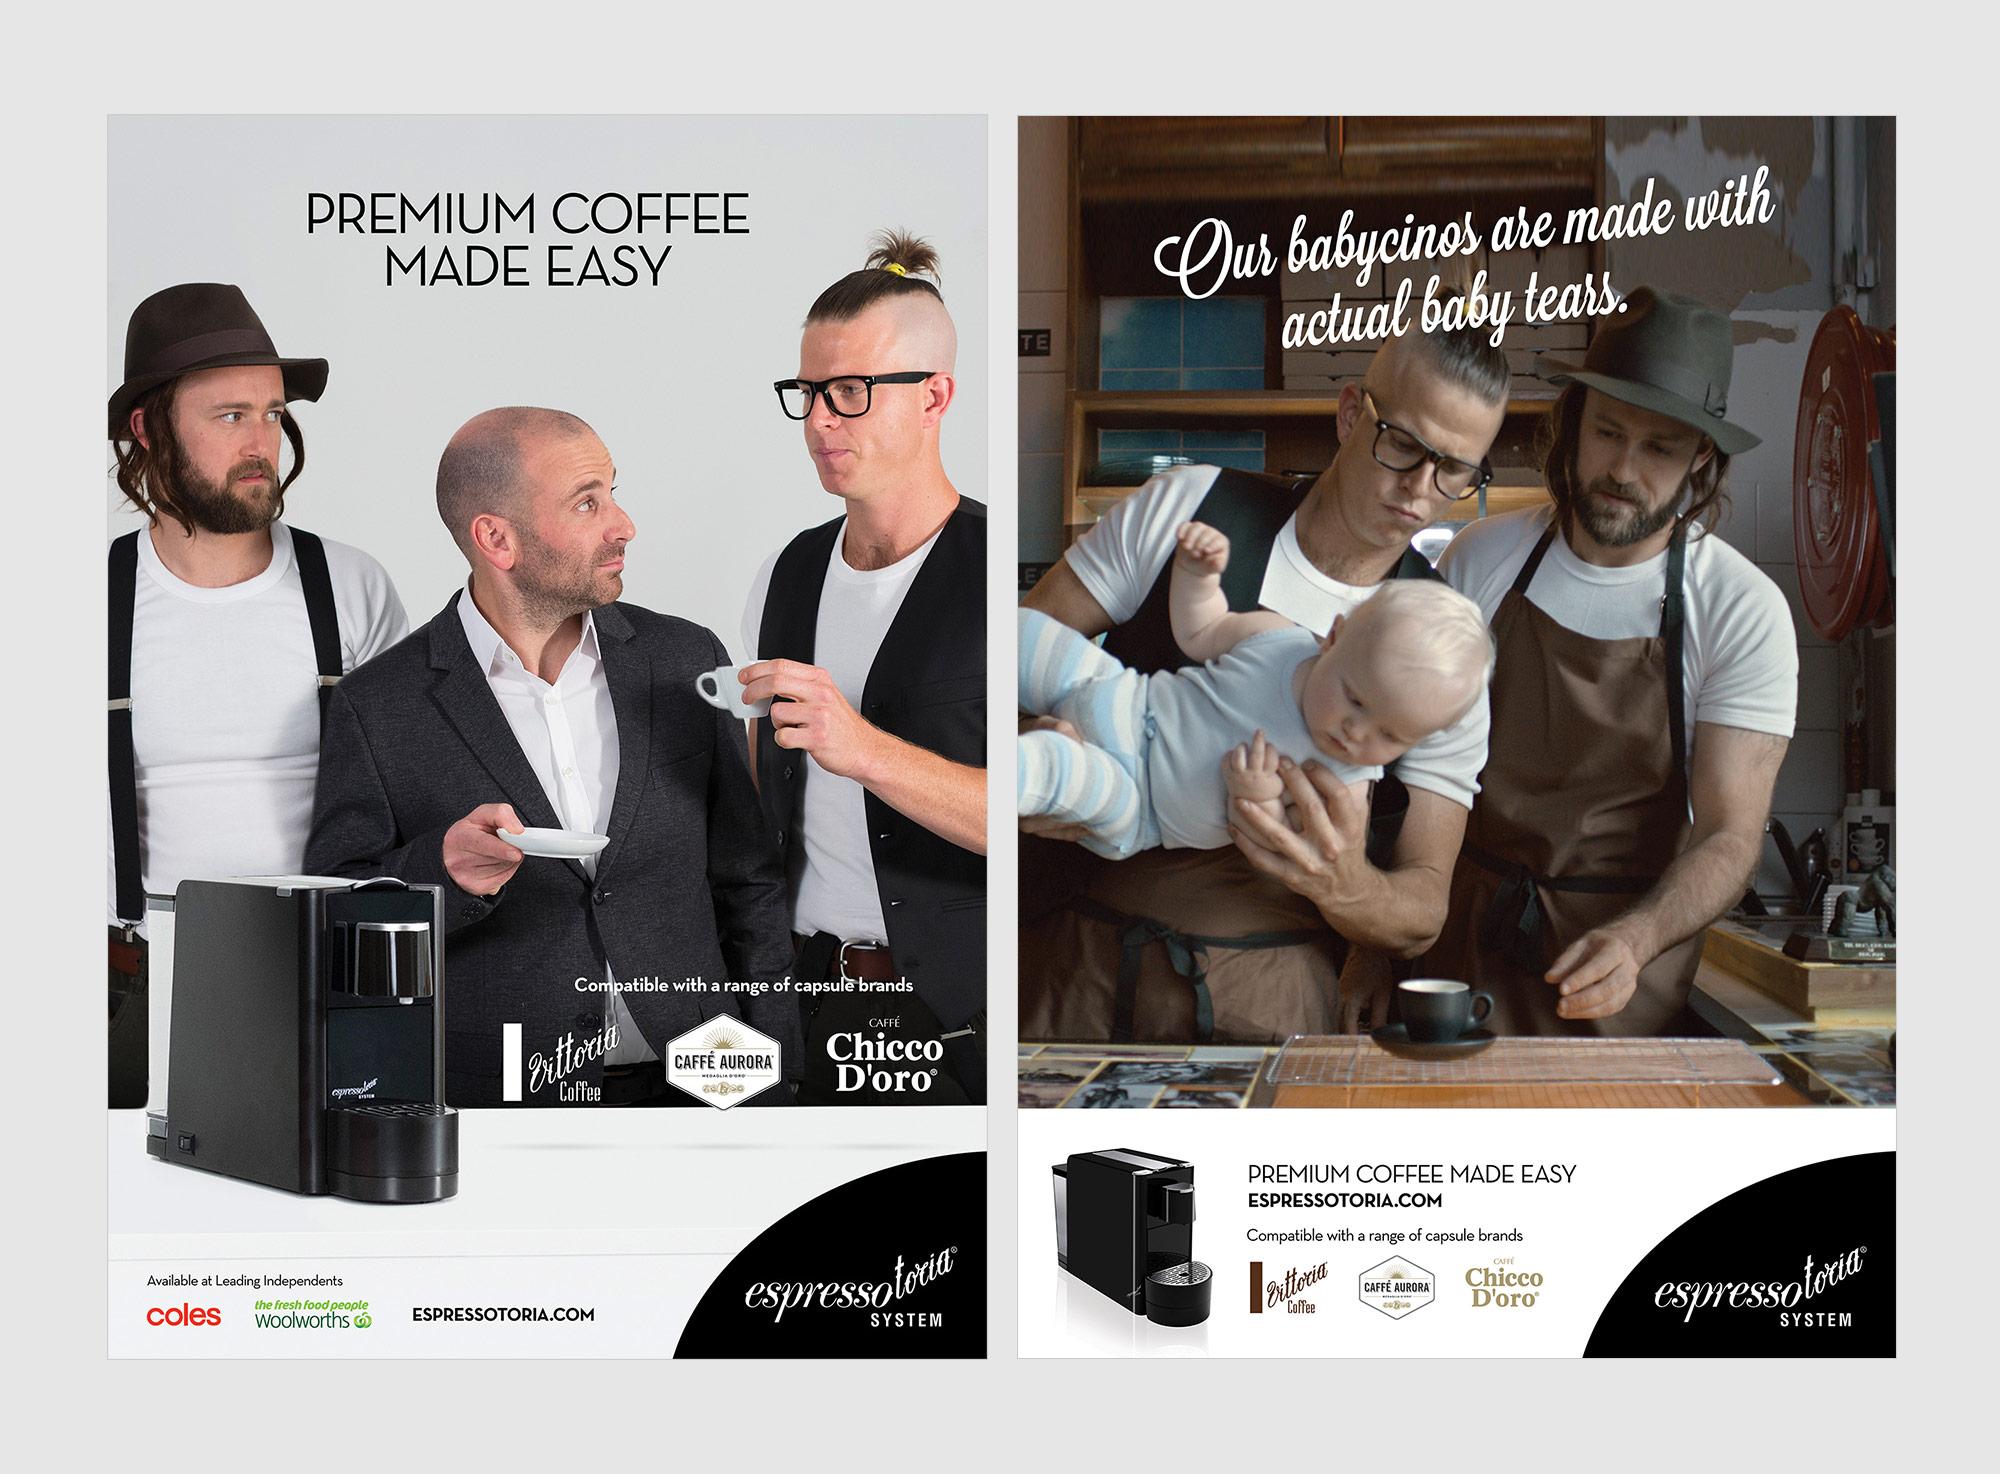 Espressotoria02.jpg